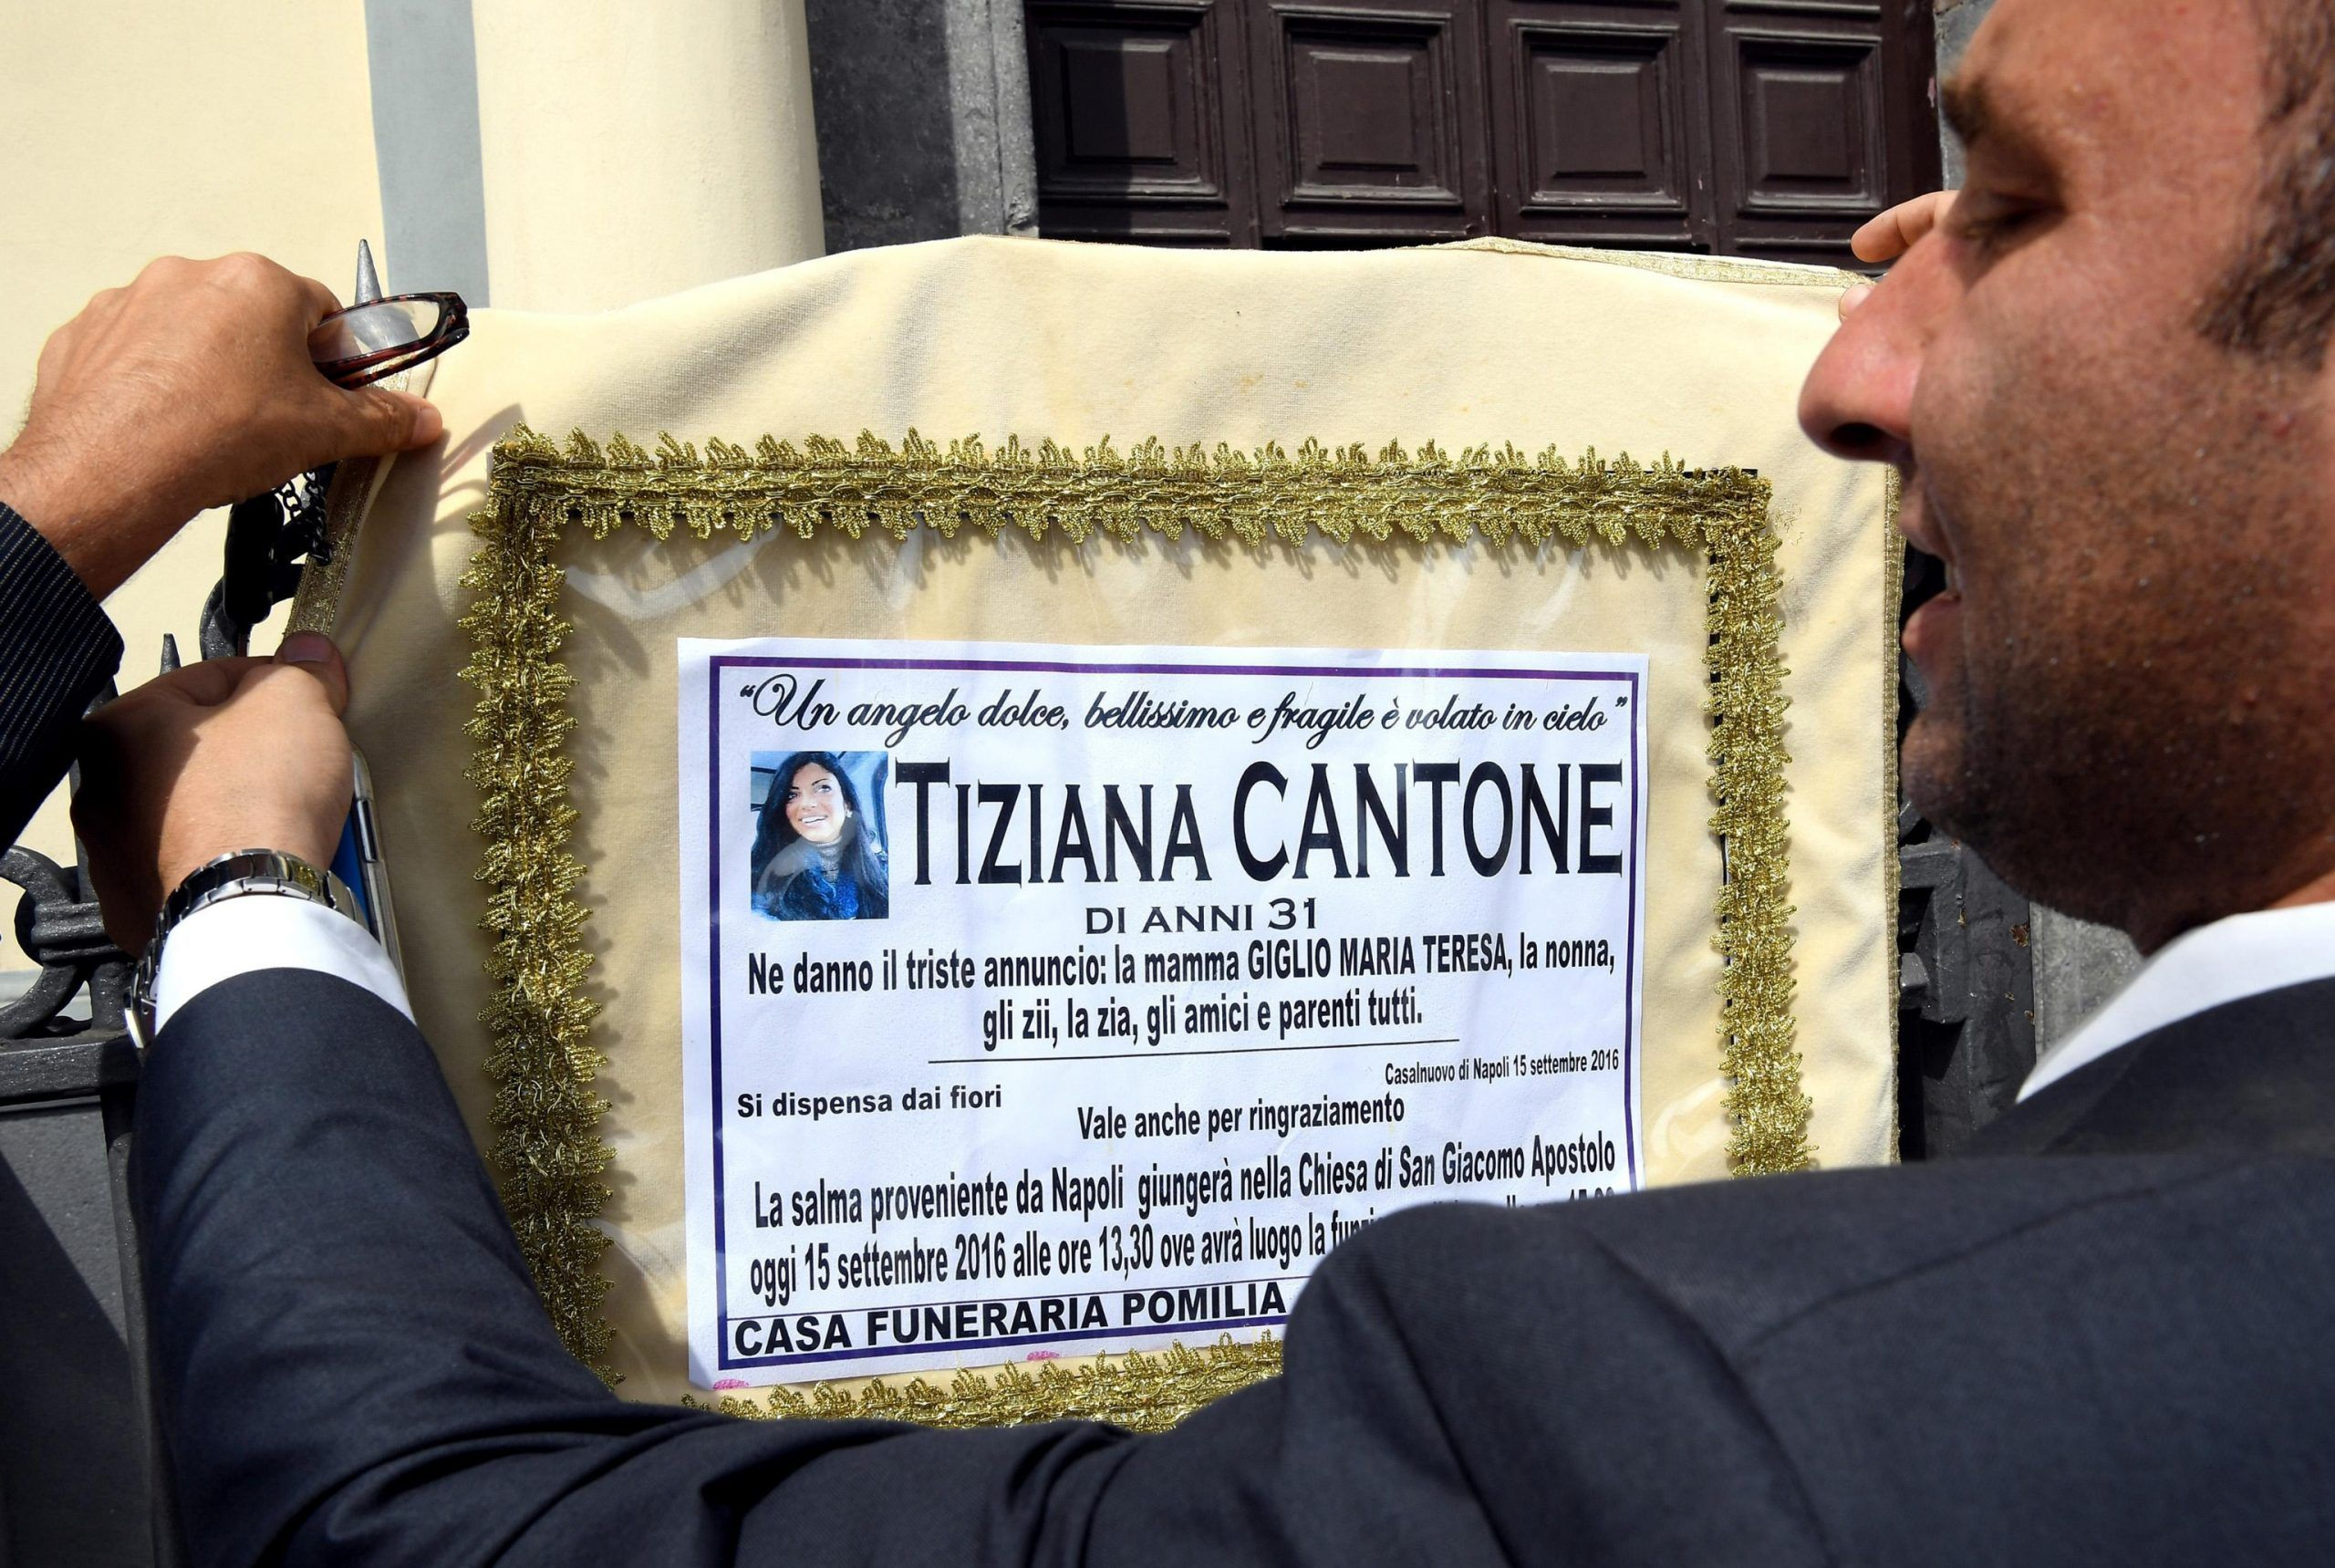 Funerali di Tiziana Cantone